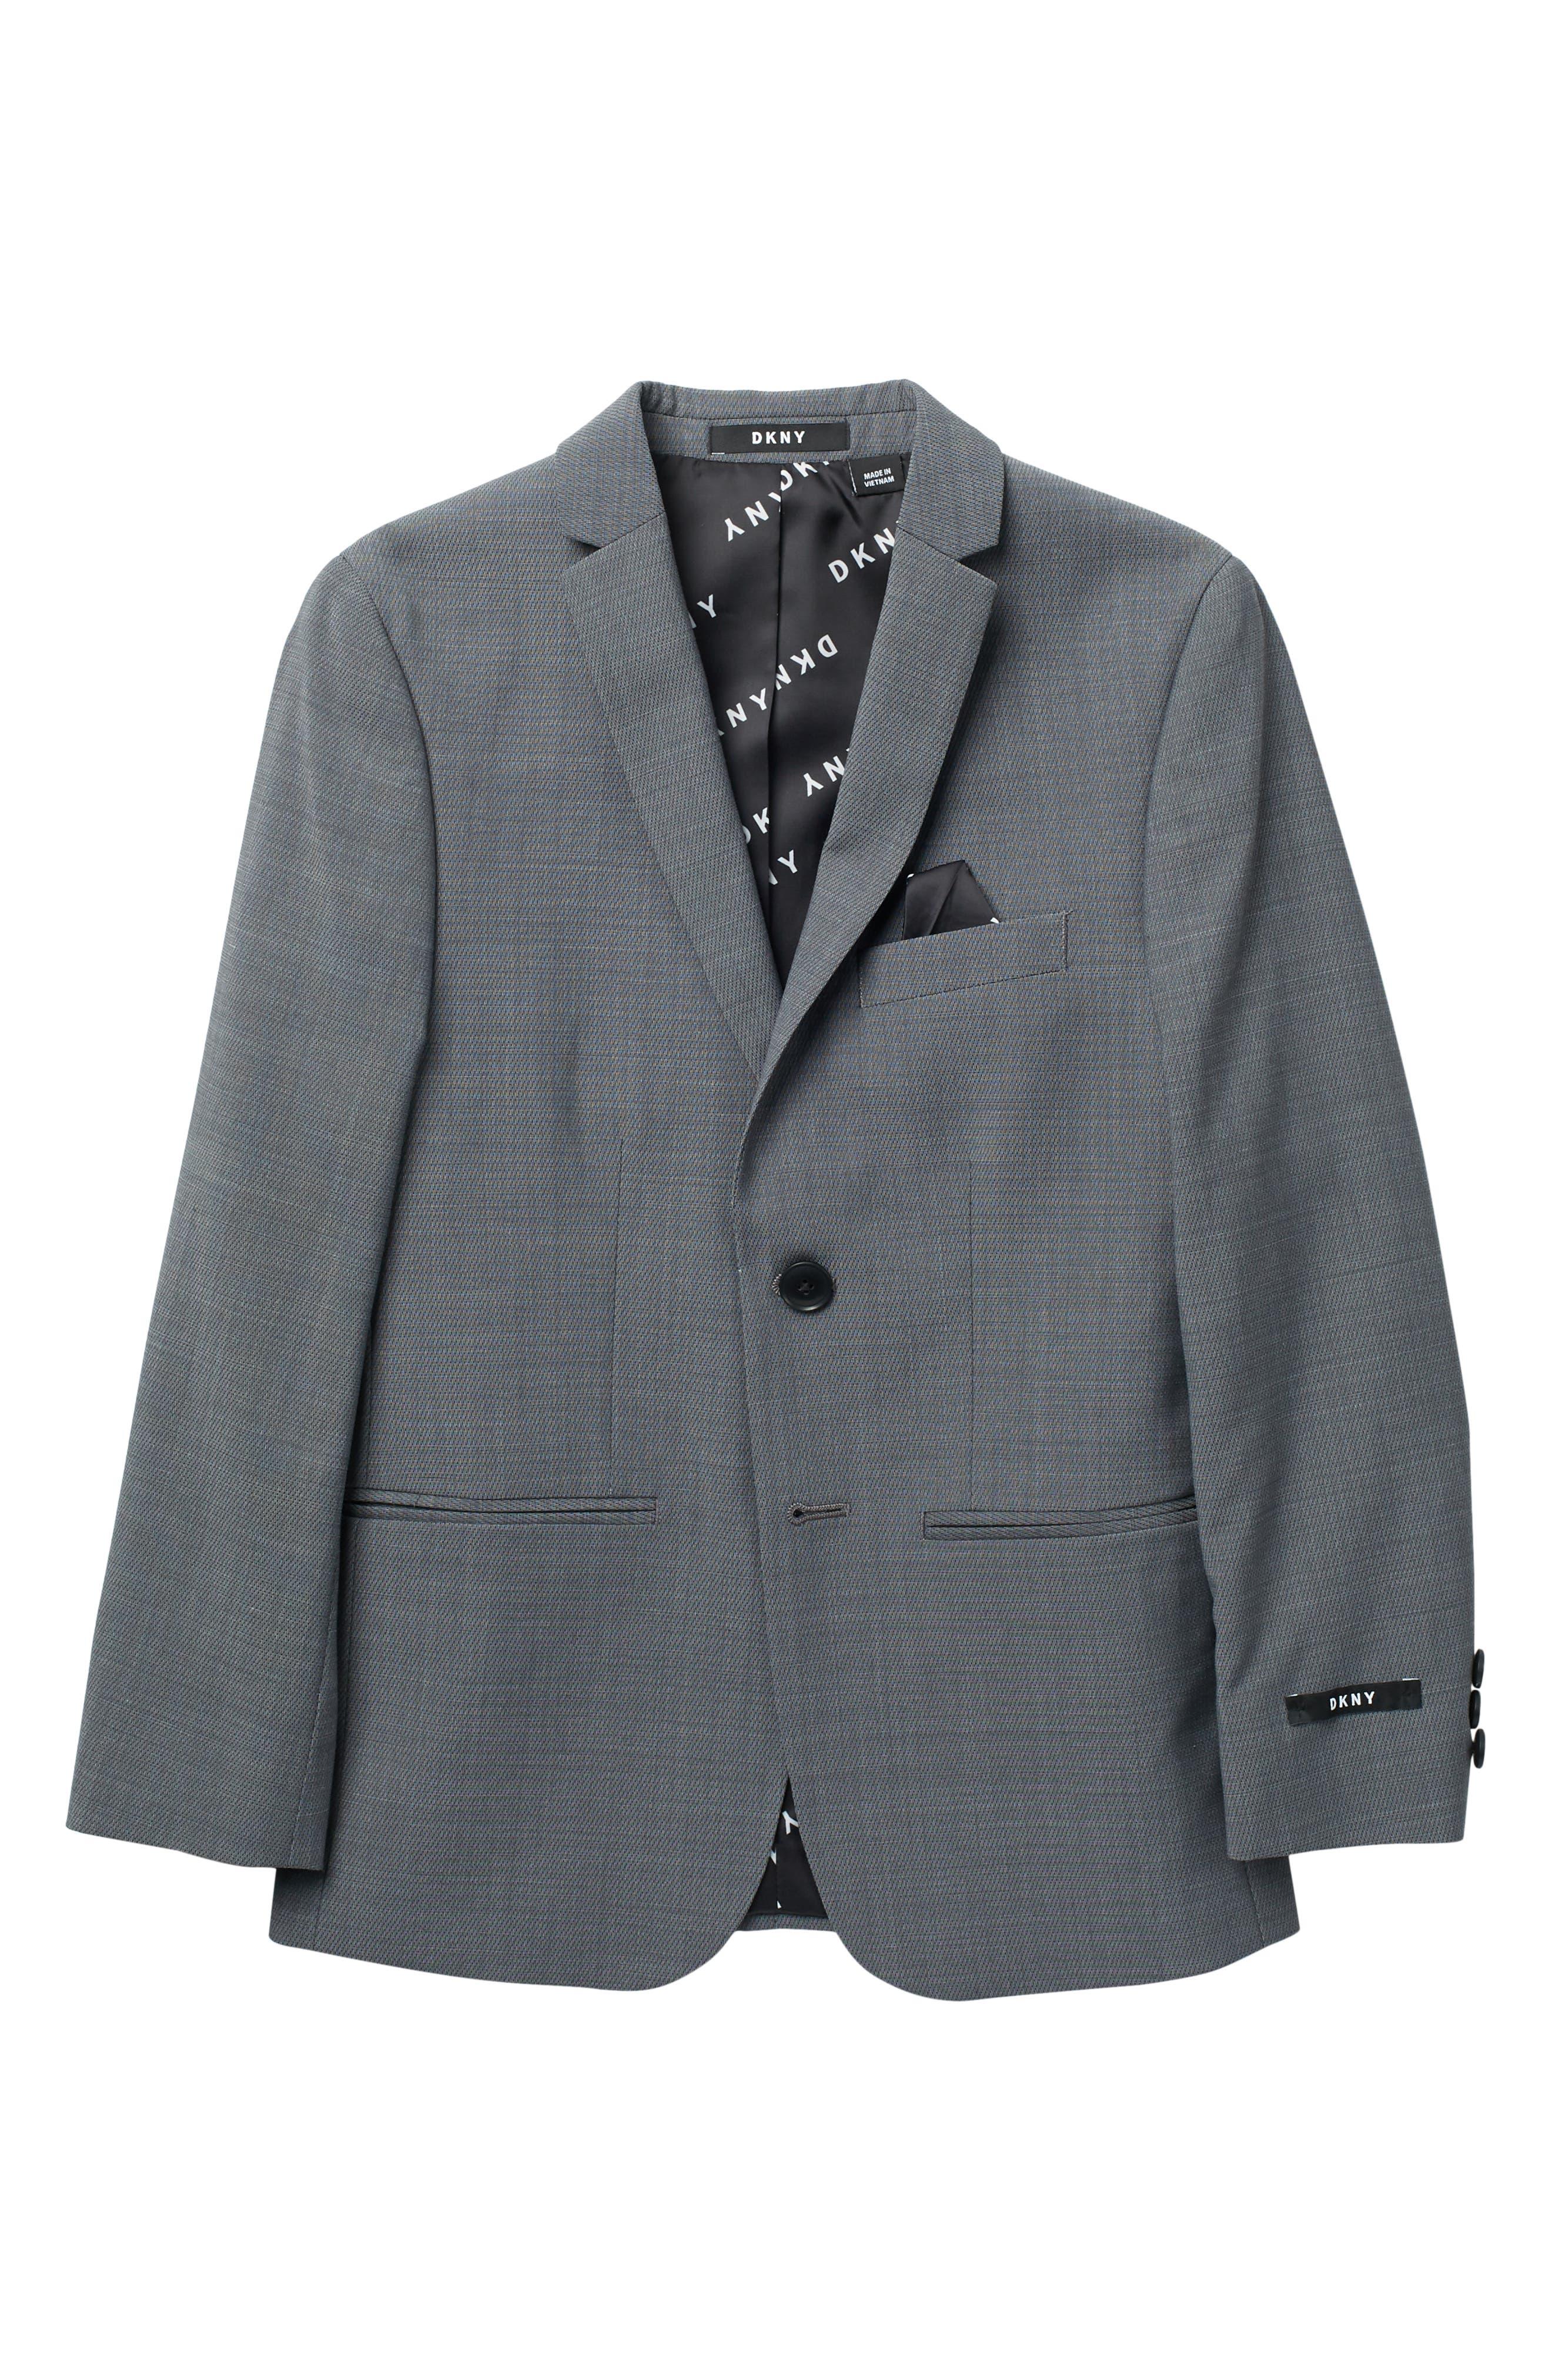 Image of DKNY Neat Wool Poly Jacket